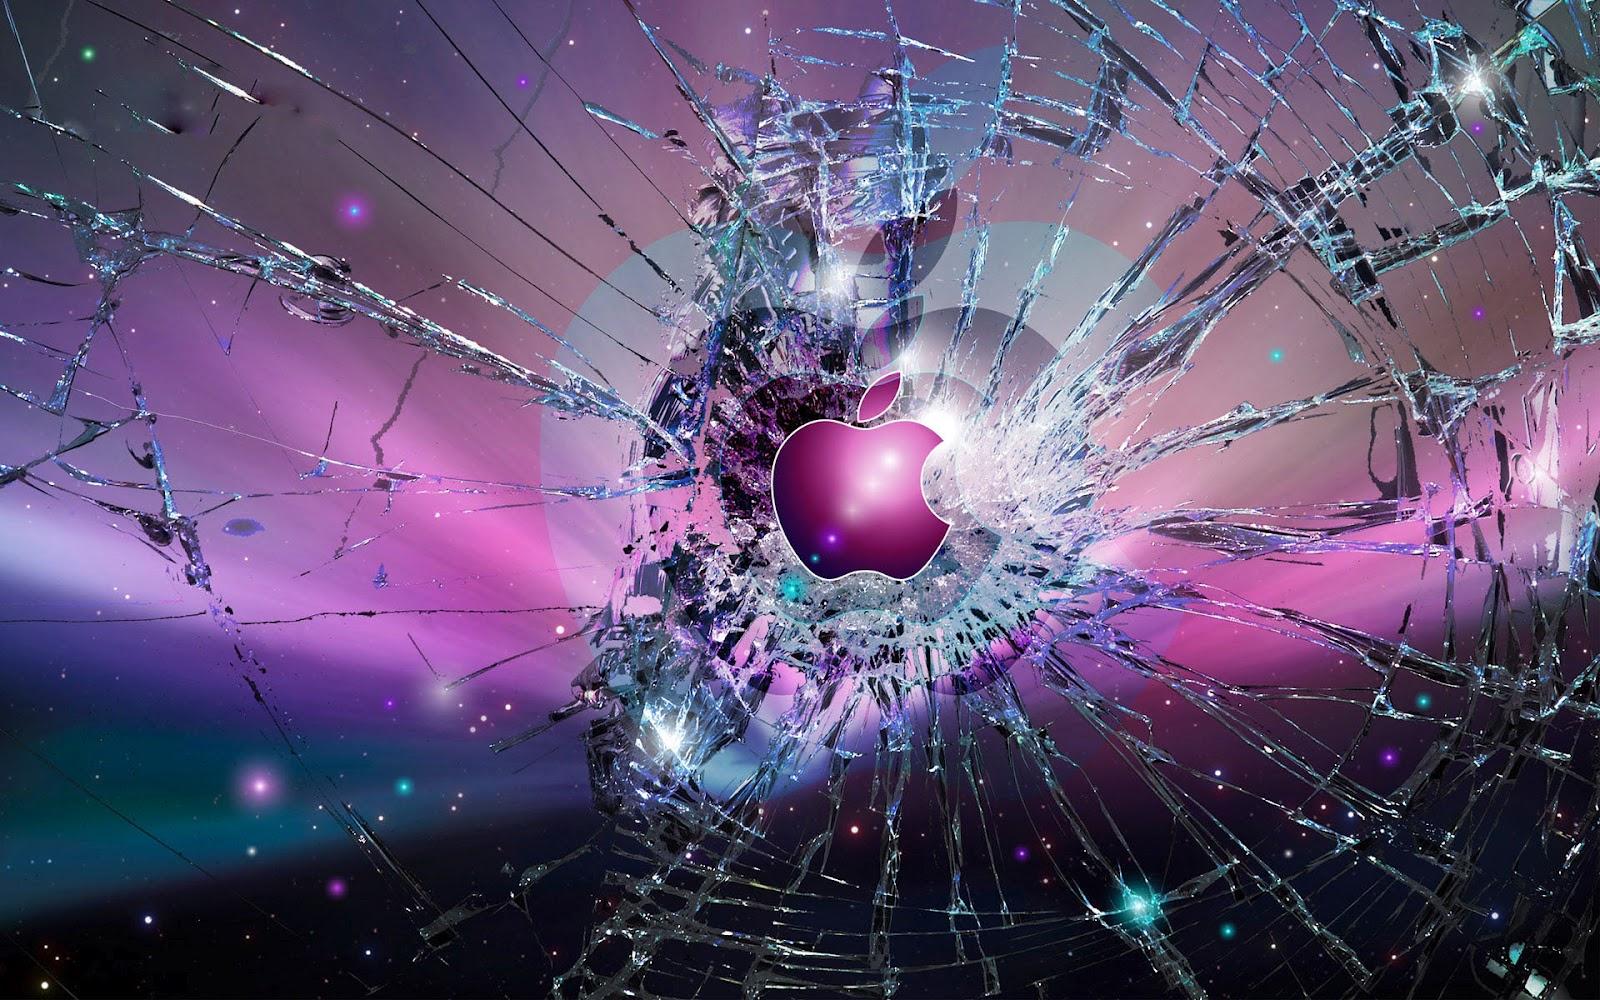 Apple Mac Wallpapers HD Nice Wallpapers 1600x1000